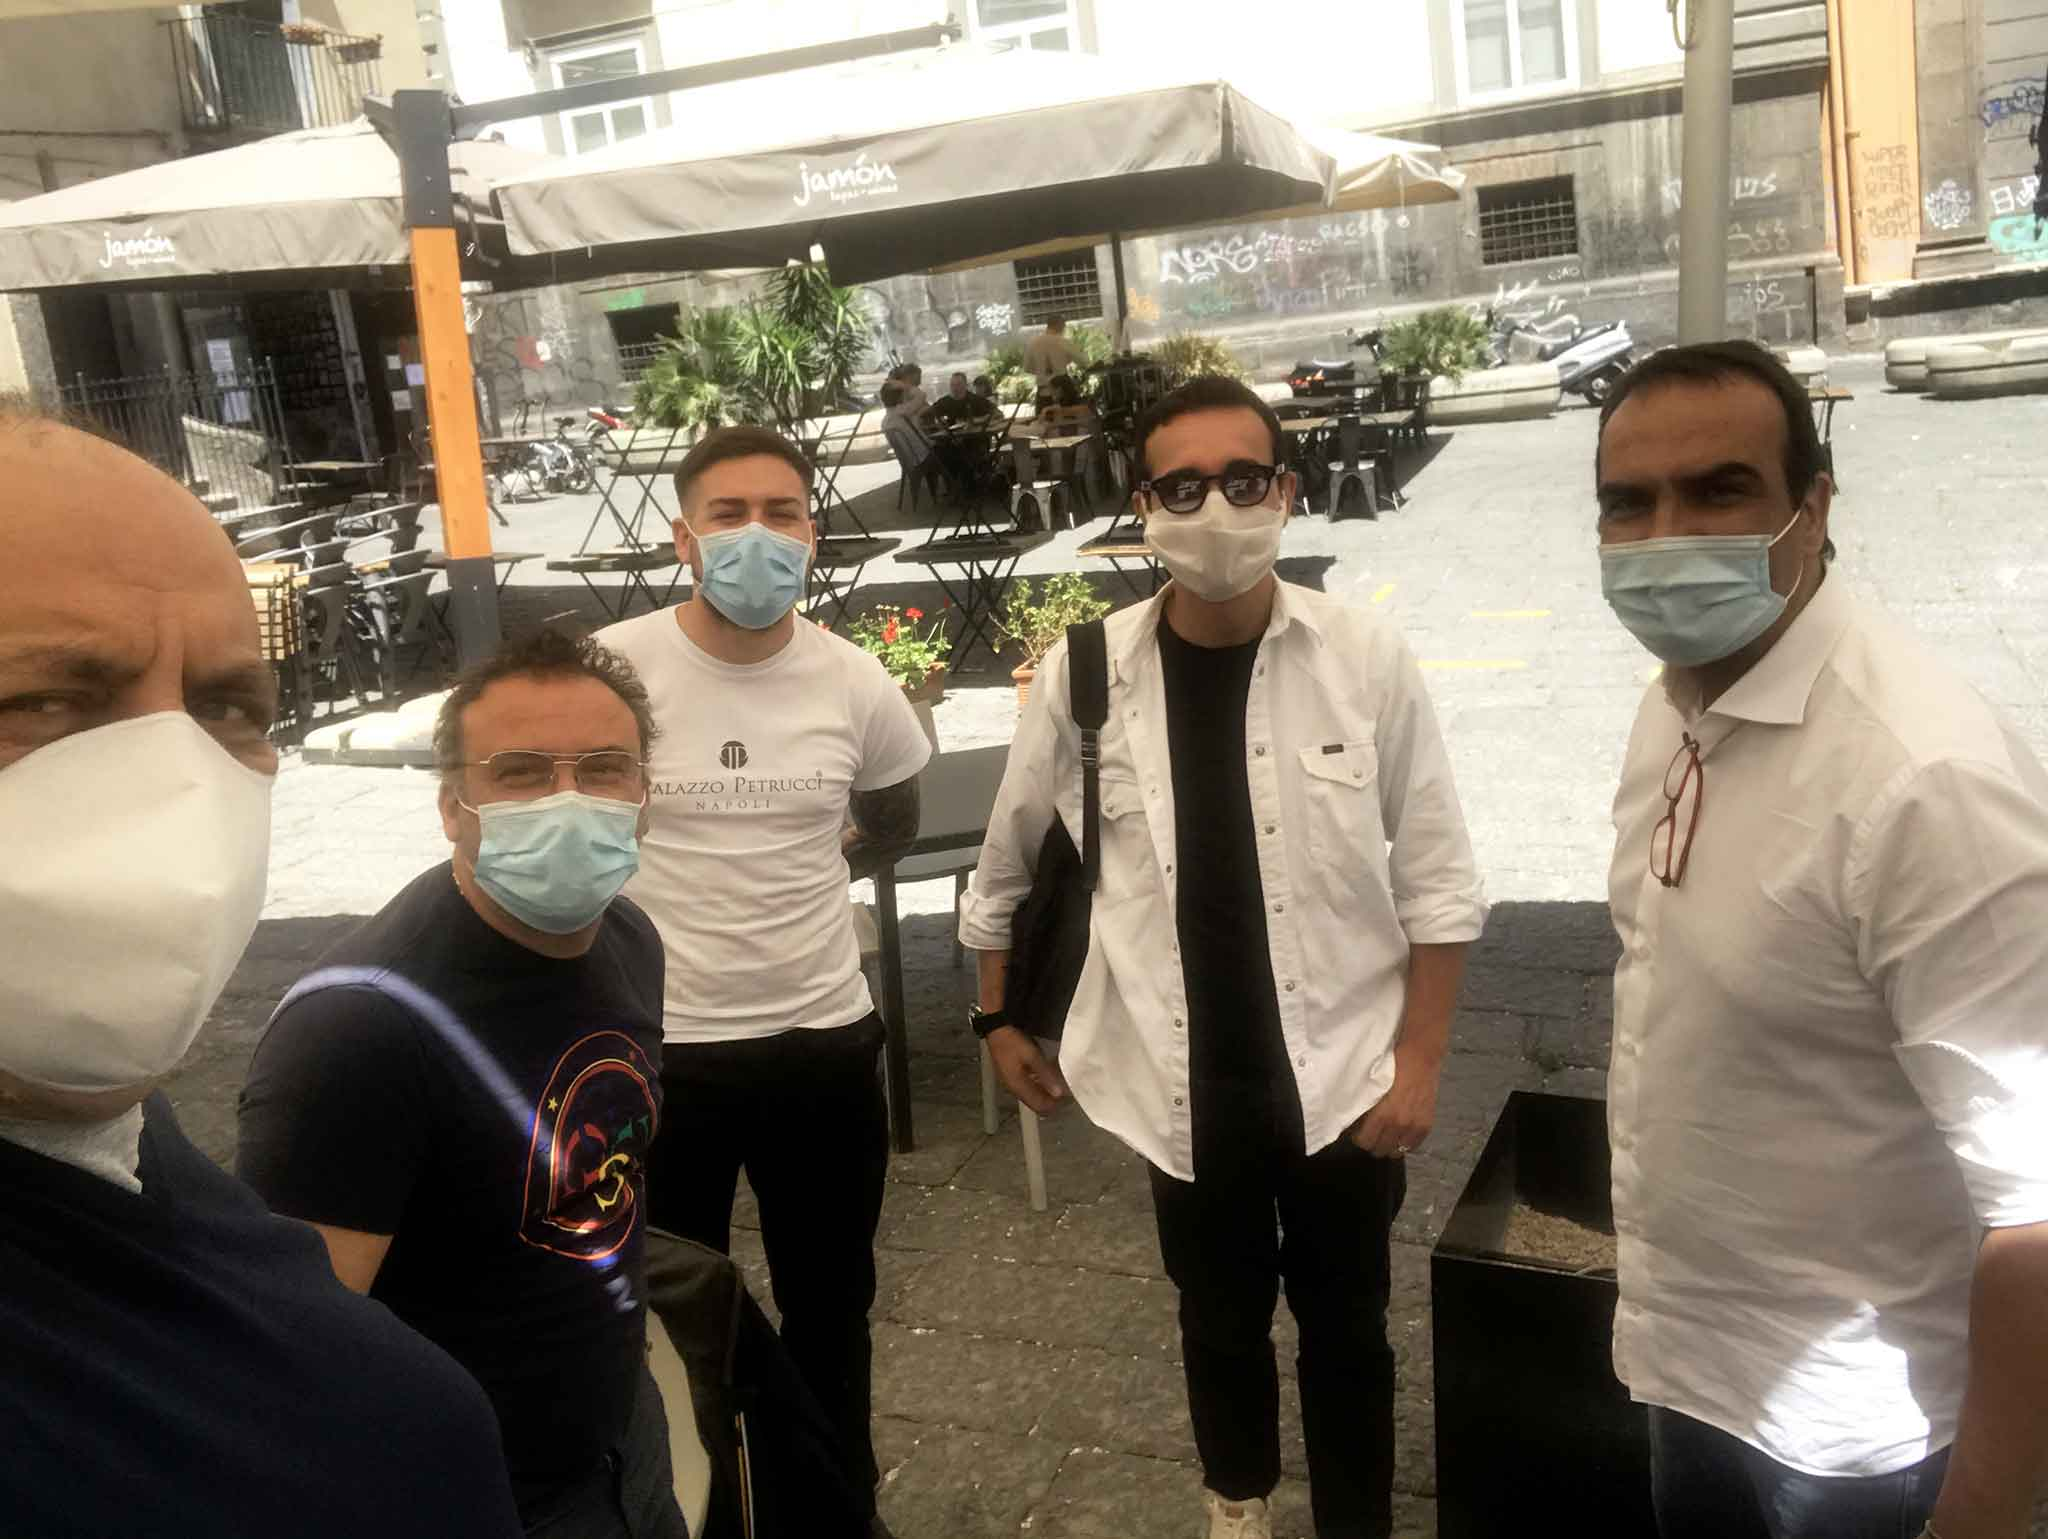 Decreto sostegni bis ristorante mascherine